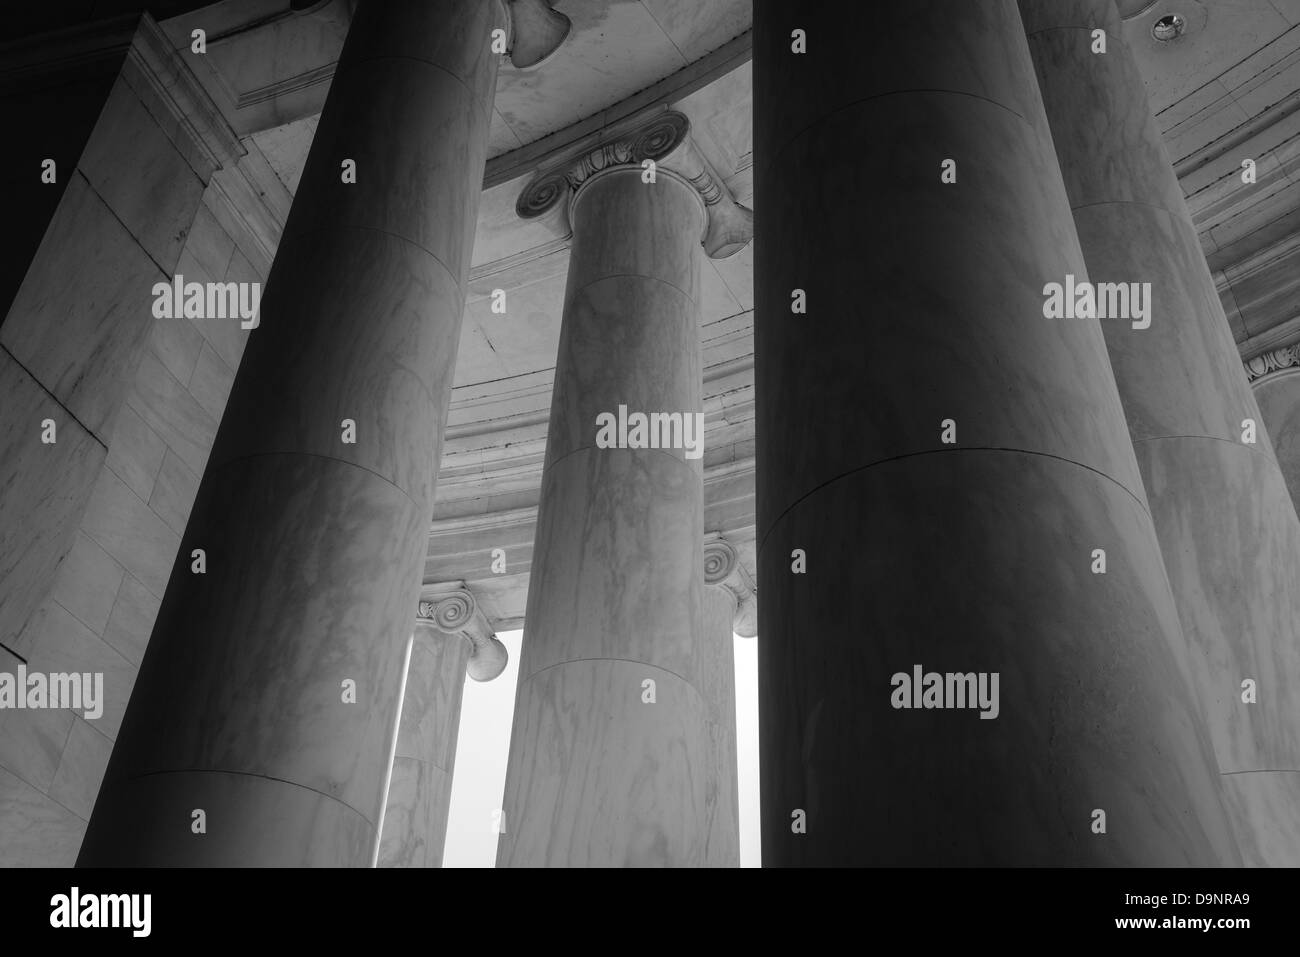 Stone Pillars in Black and White - Stock Image